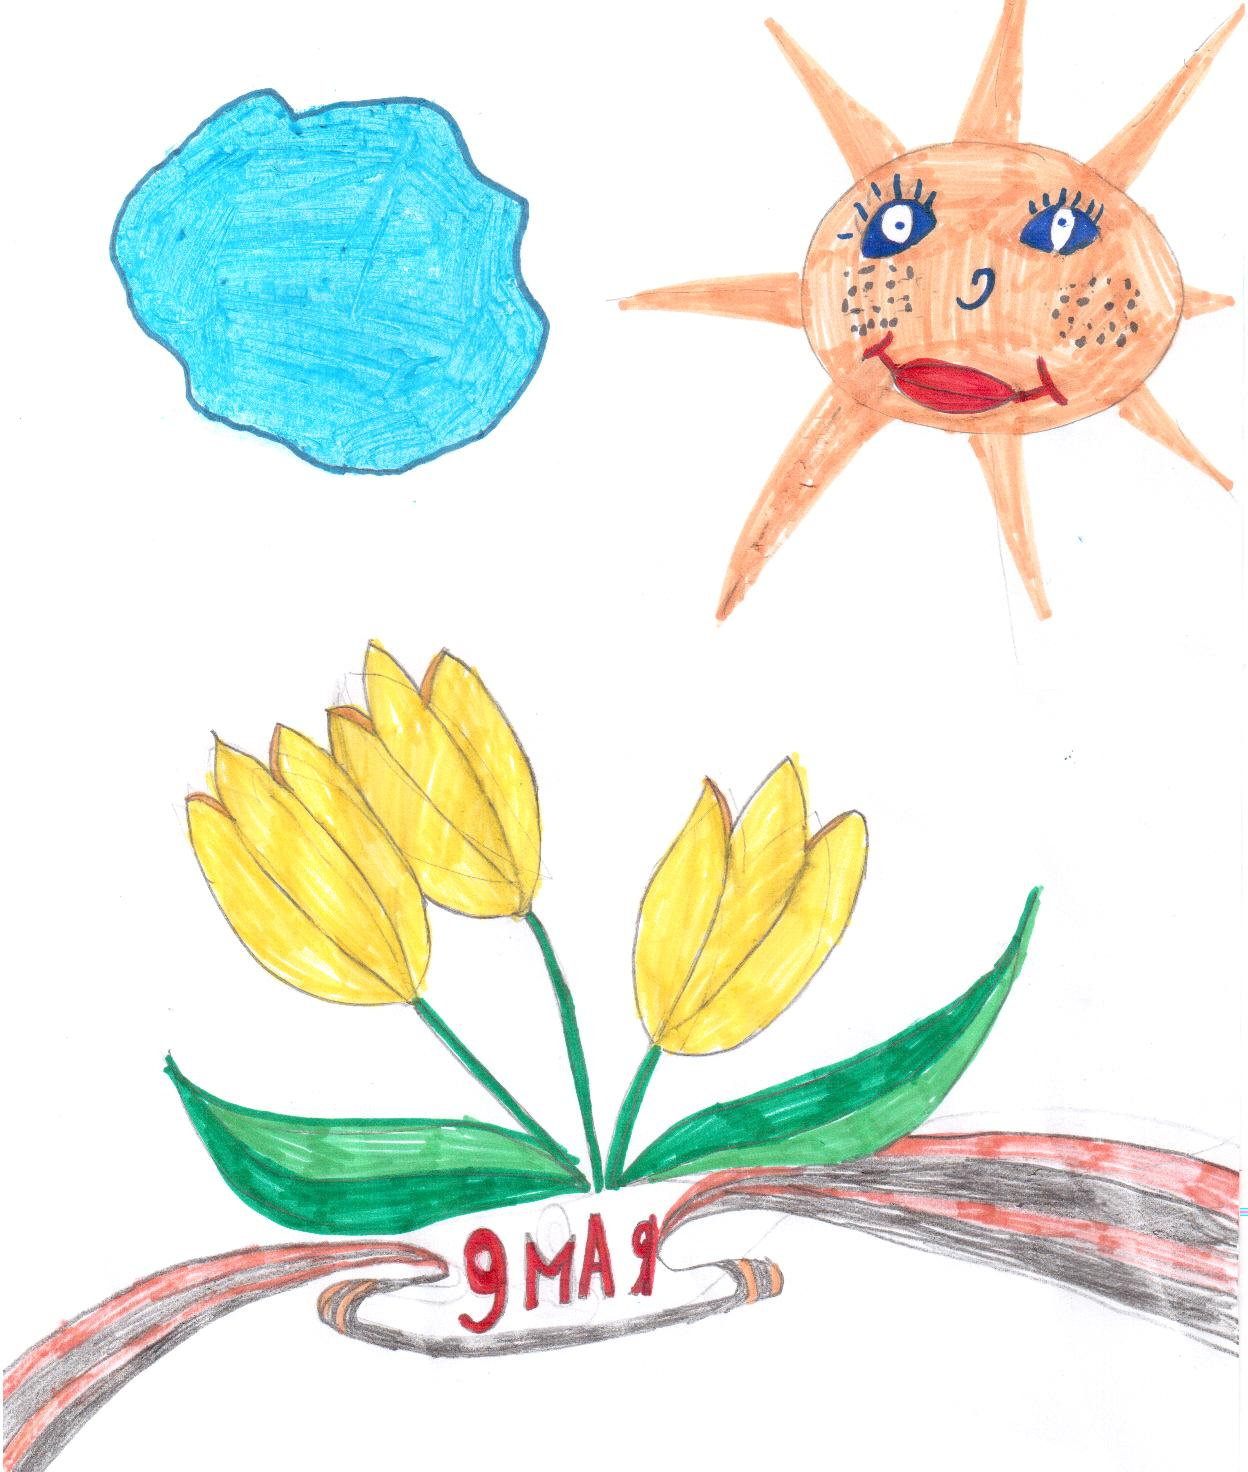 картинки карандашом на день победы 9 мая